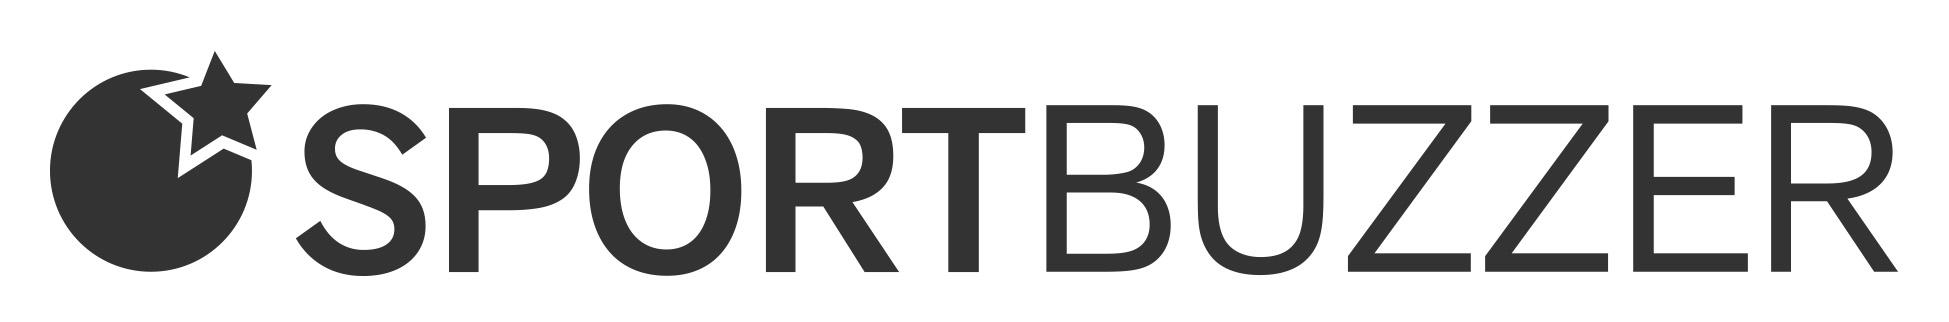 Sportbuzzer_Logo Kopie